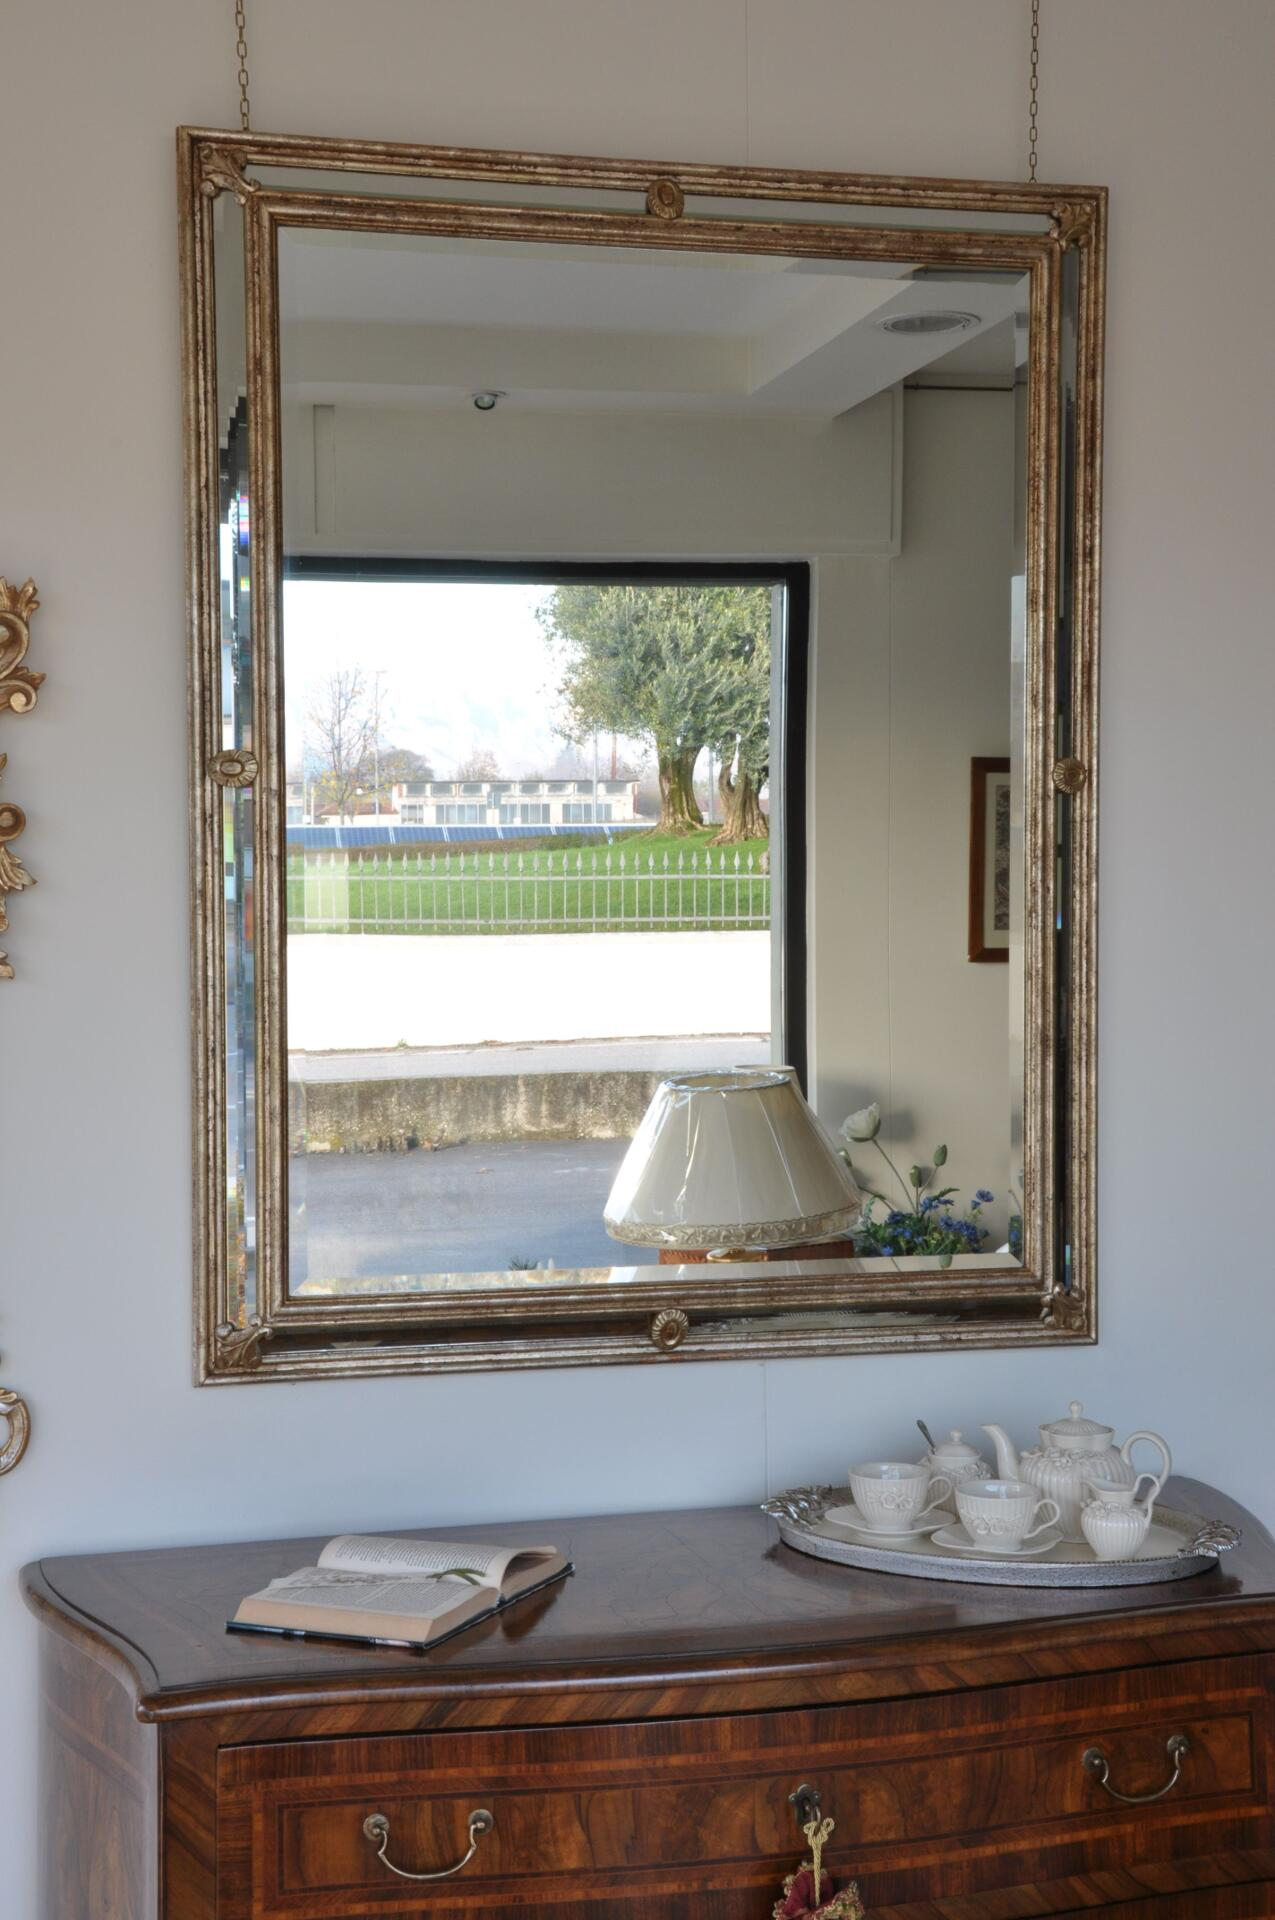 Specchiera scolpita in stile luigi xiv fiorentino mobili for Mobili luigi